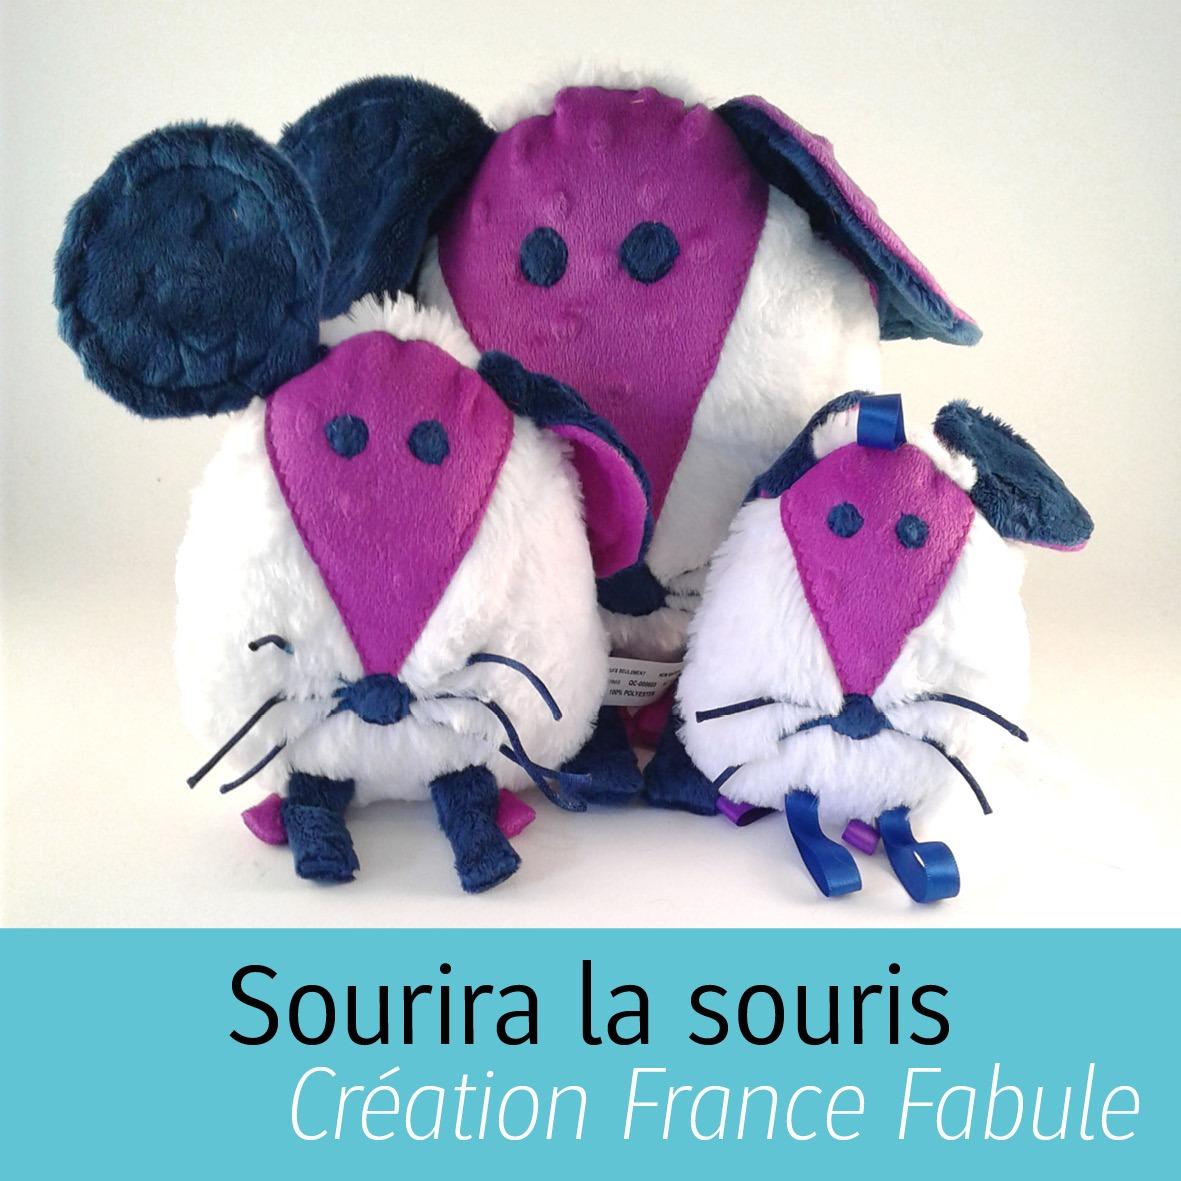 Peluche Créations France Fabule de Manu Factum